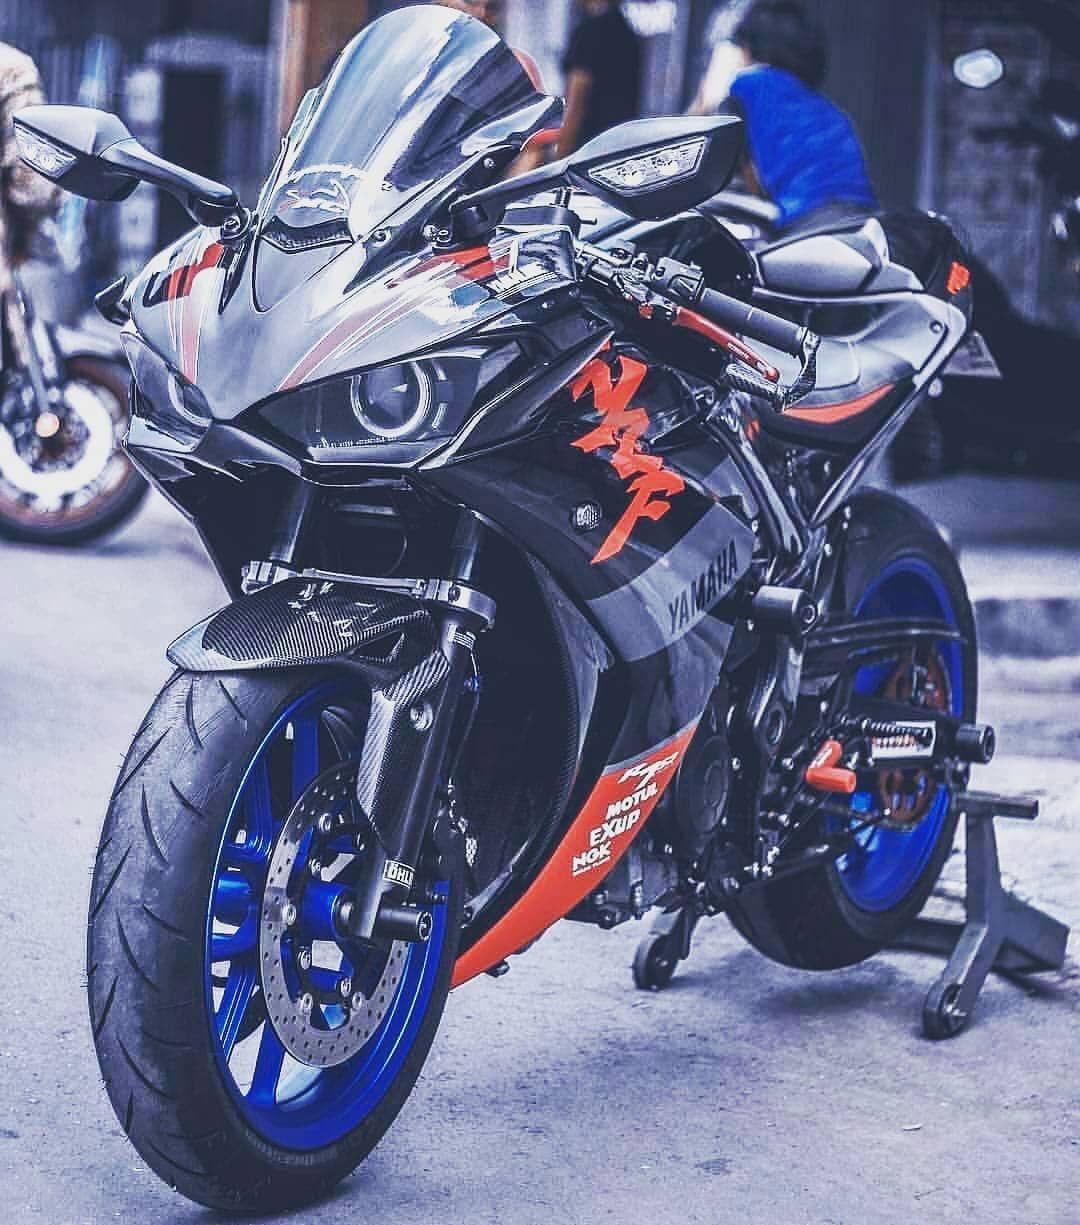 Yamaha Suzuki Honda Kawasaki Ktm Ducati Repsol Motorcycle